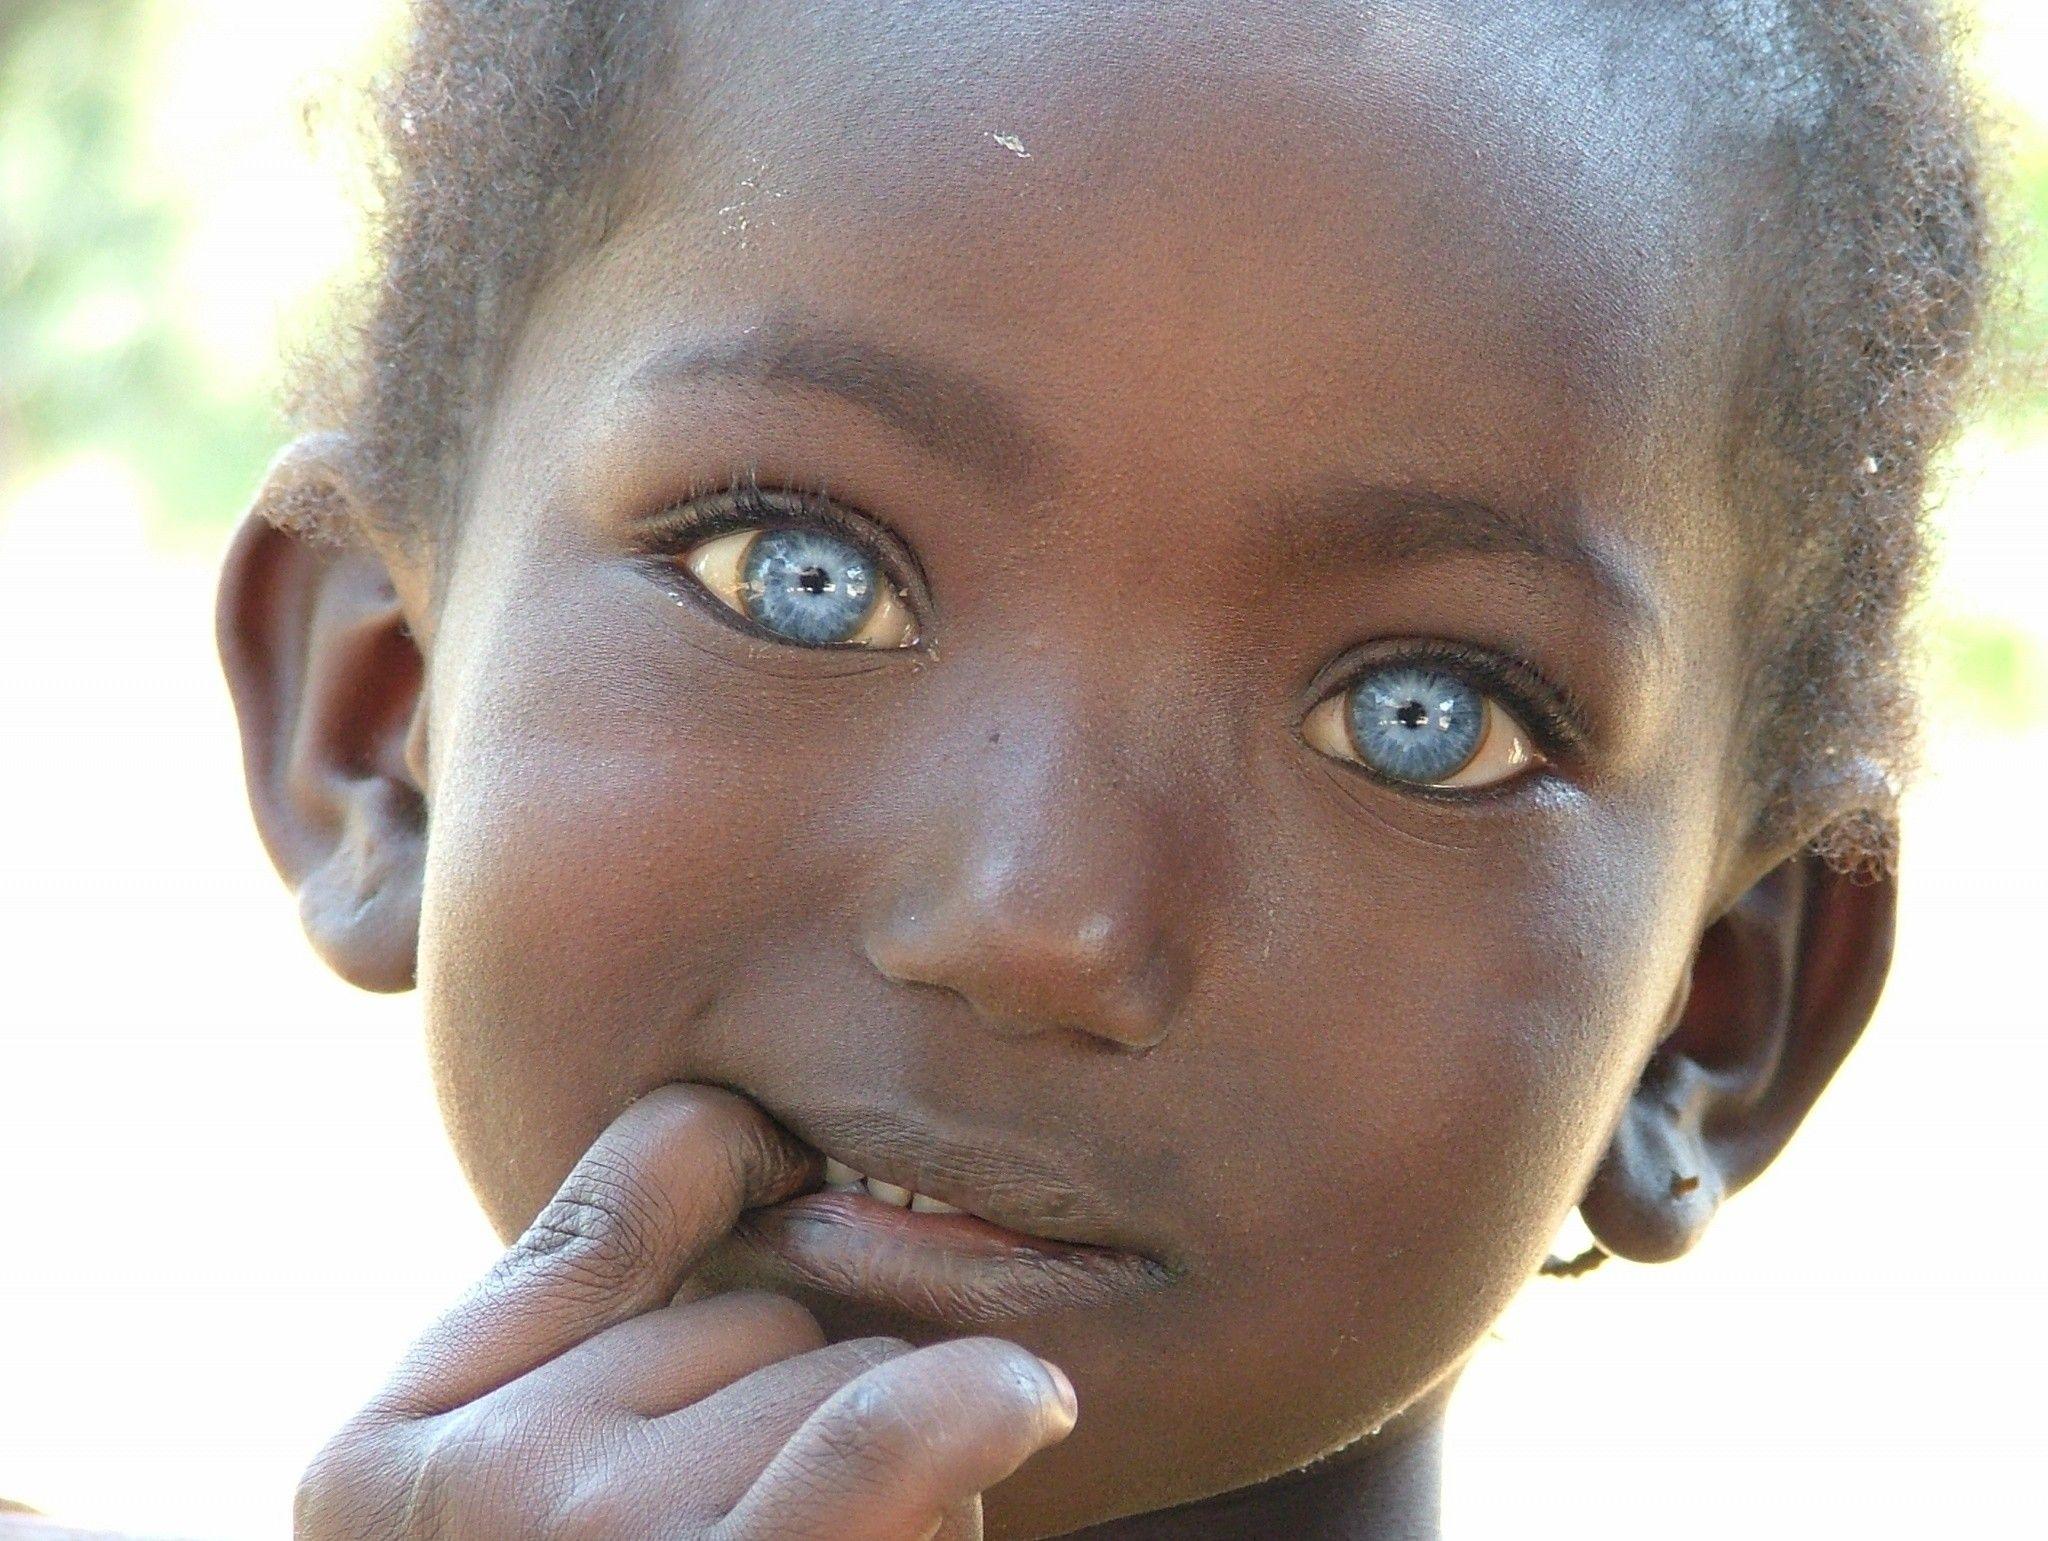 NEGRITOS Negro black beauty beautiful afro